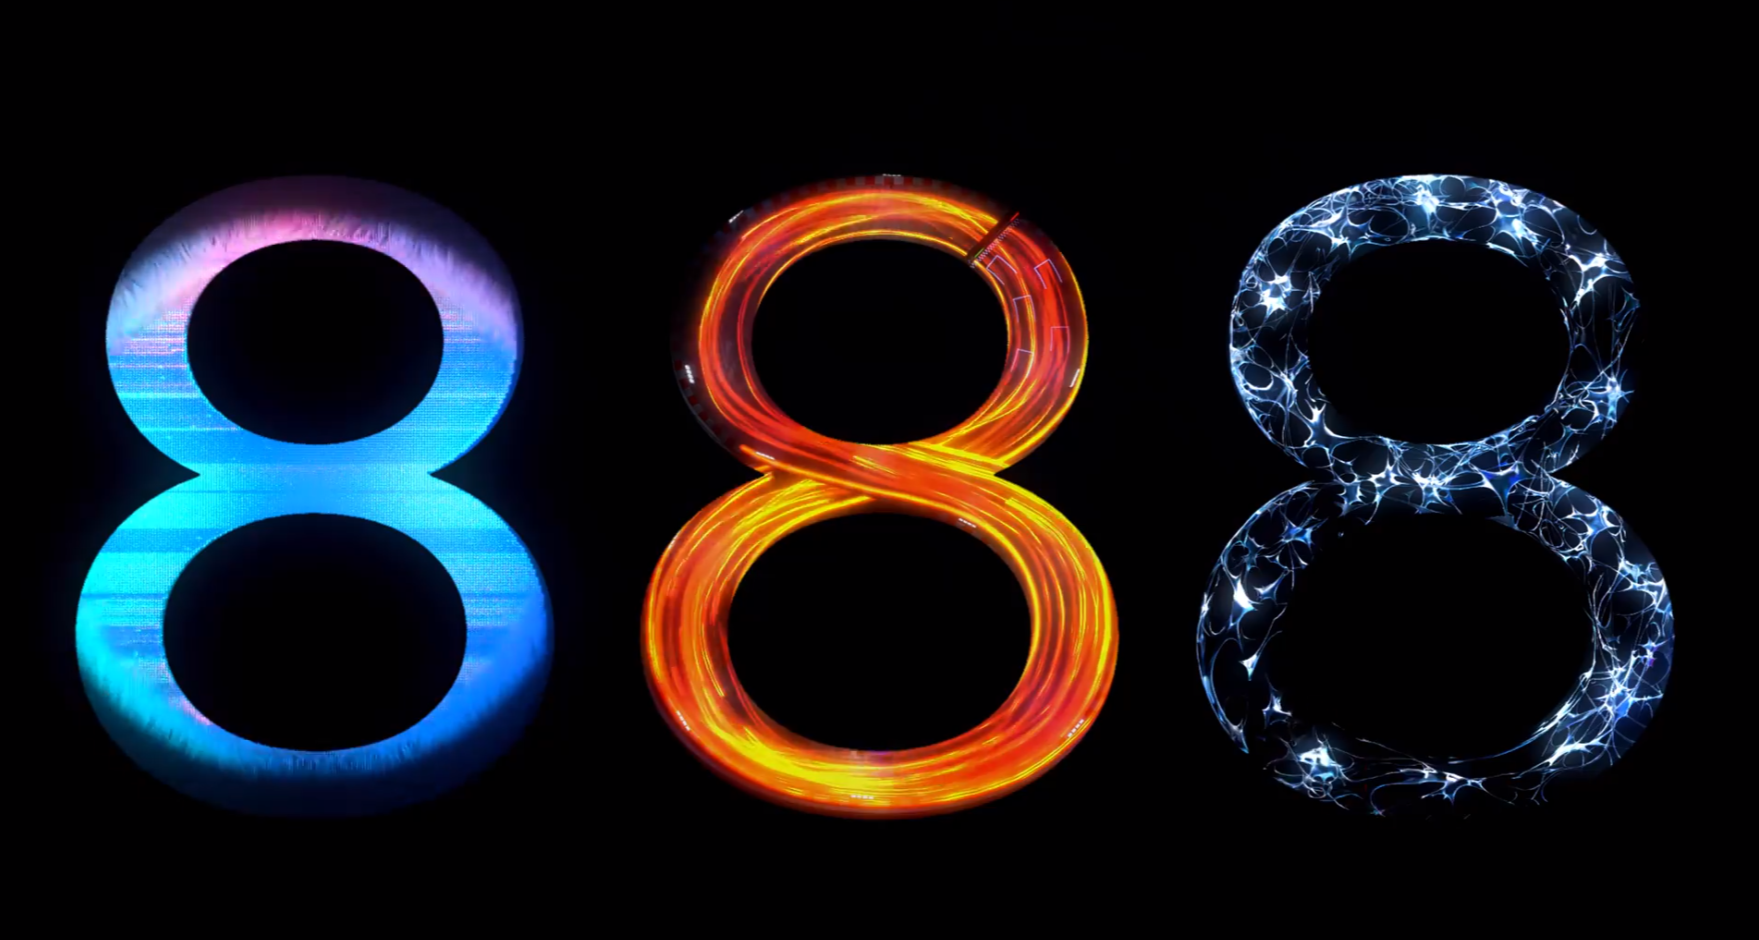 Mobile first! Snapdragon 888 zeigt uns die Gaming-Zukunft